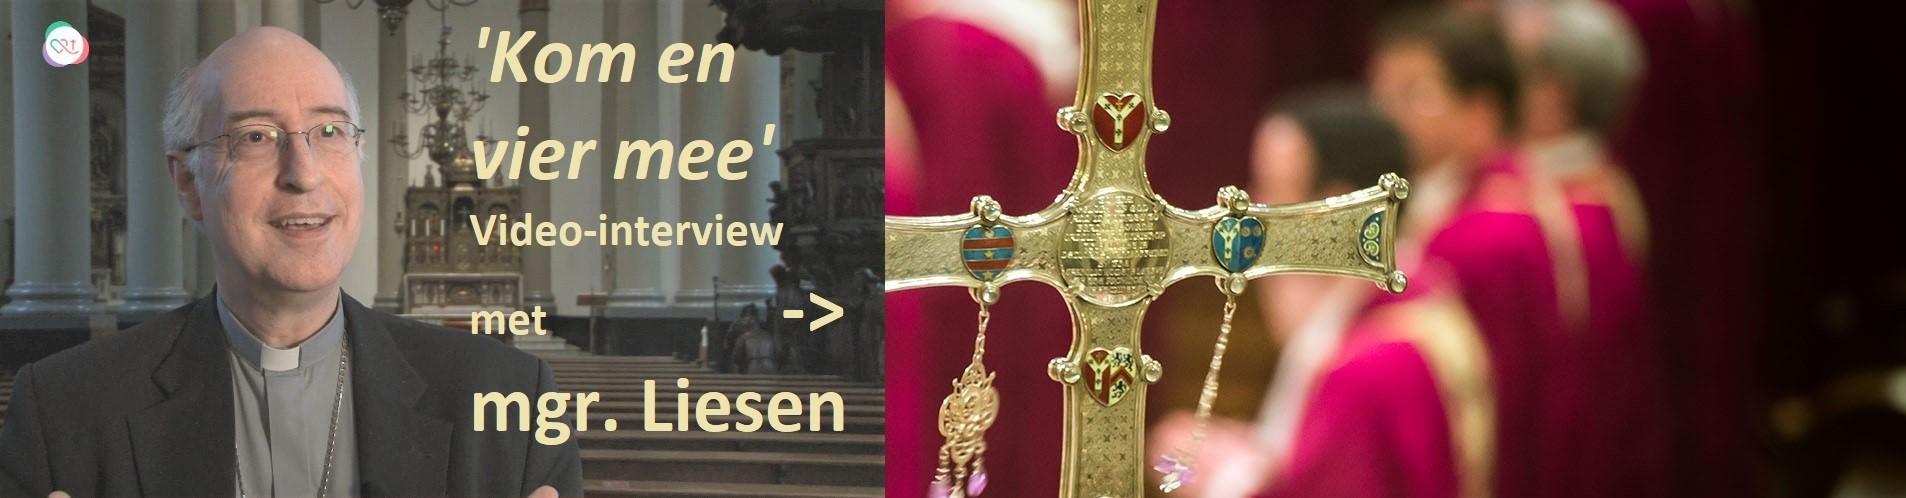 video interview met mgr. Liesen 'kom en vier mee'